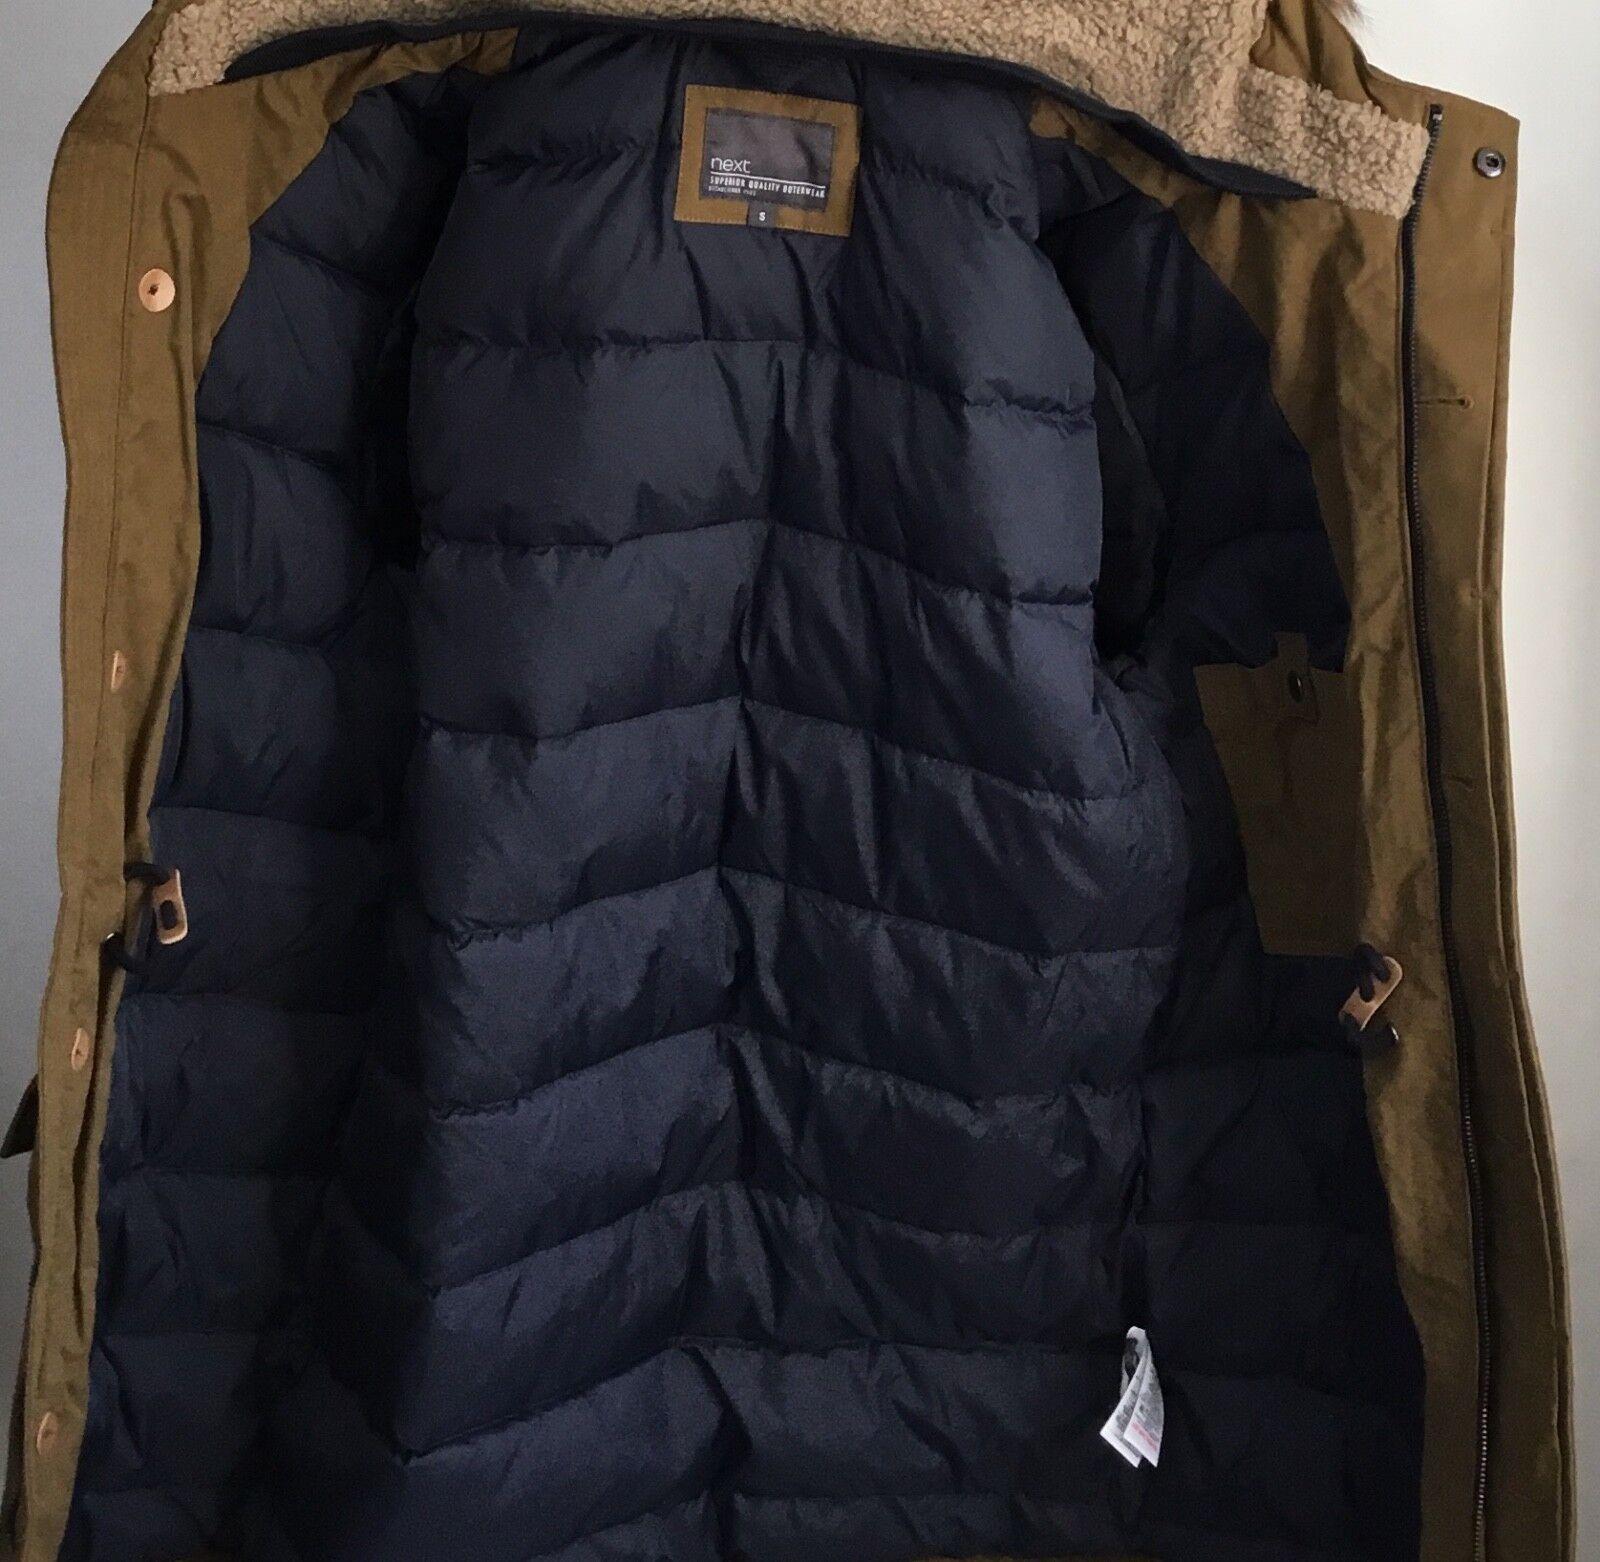 Fill S Homme Parka Prochain Premium Rrp Veste Taille Down £ Sable EqOAaw